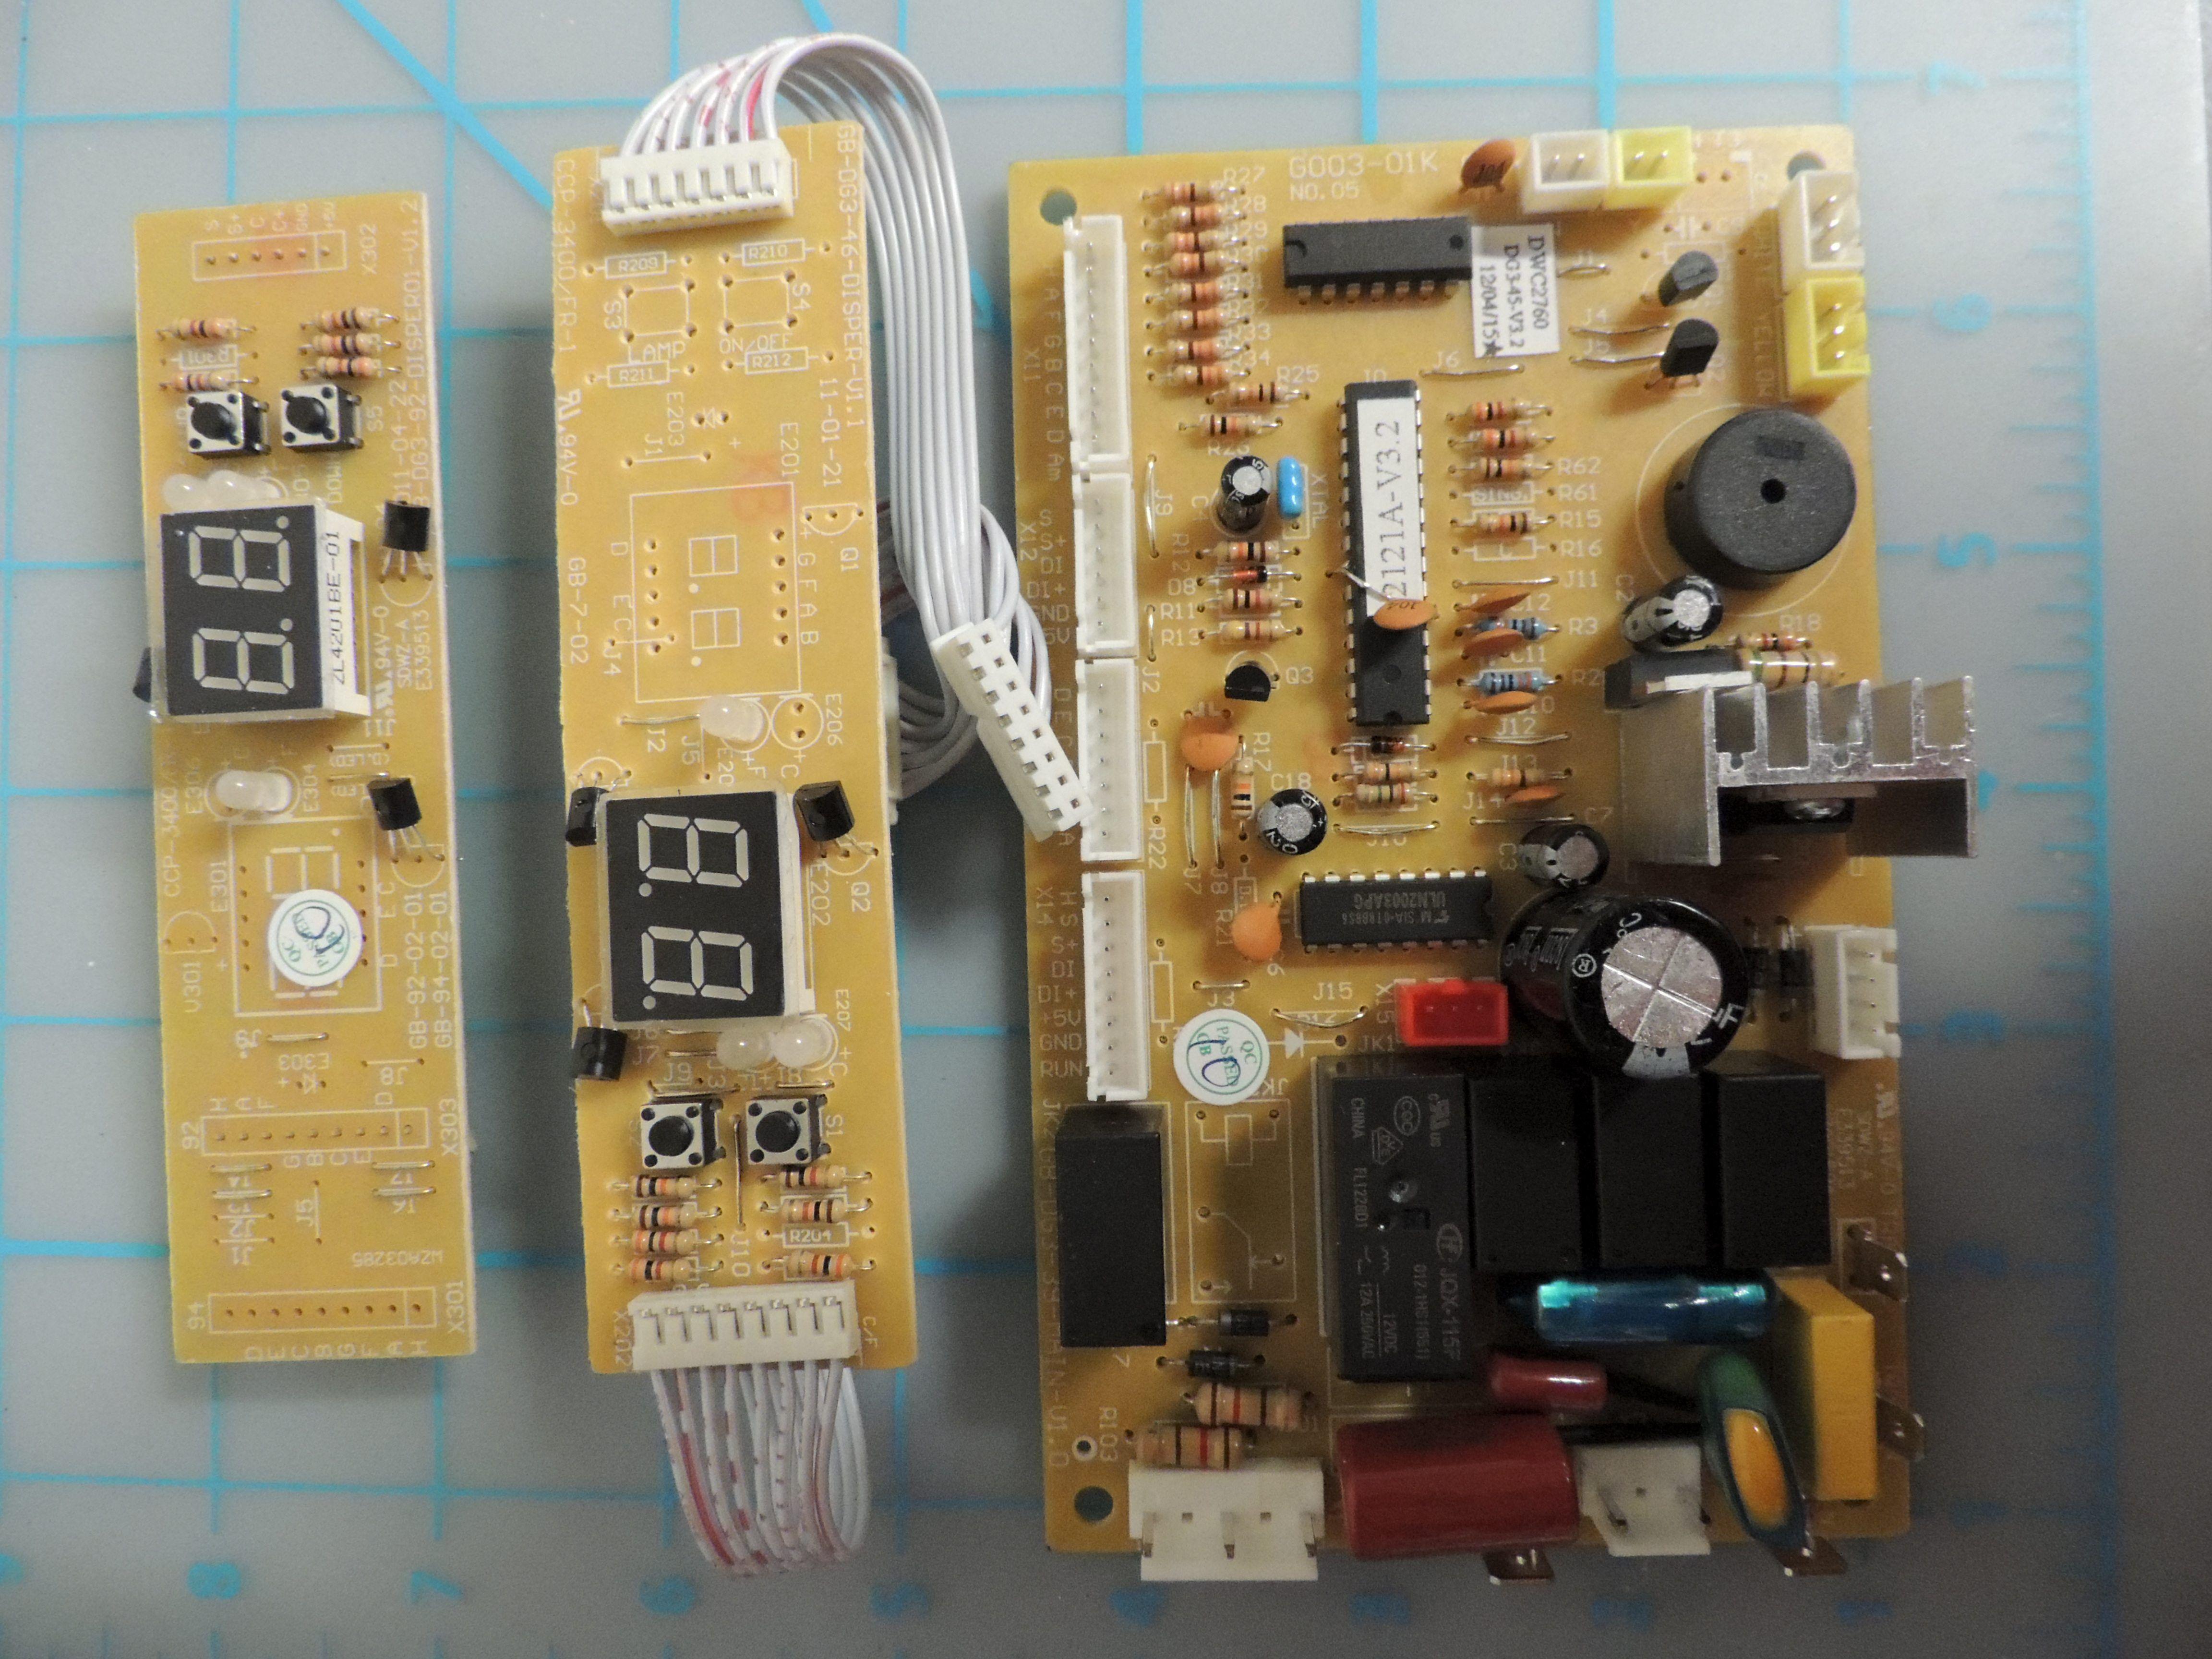 DWC54 PCB BOARD